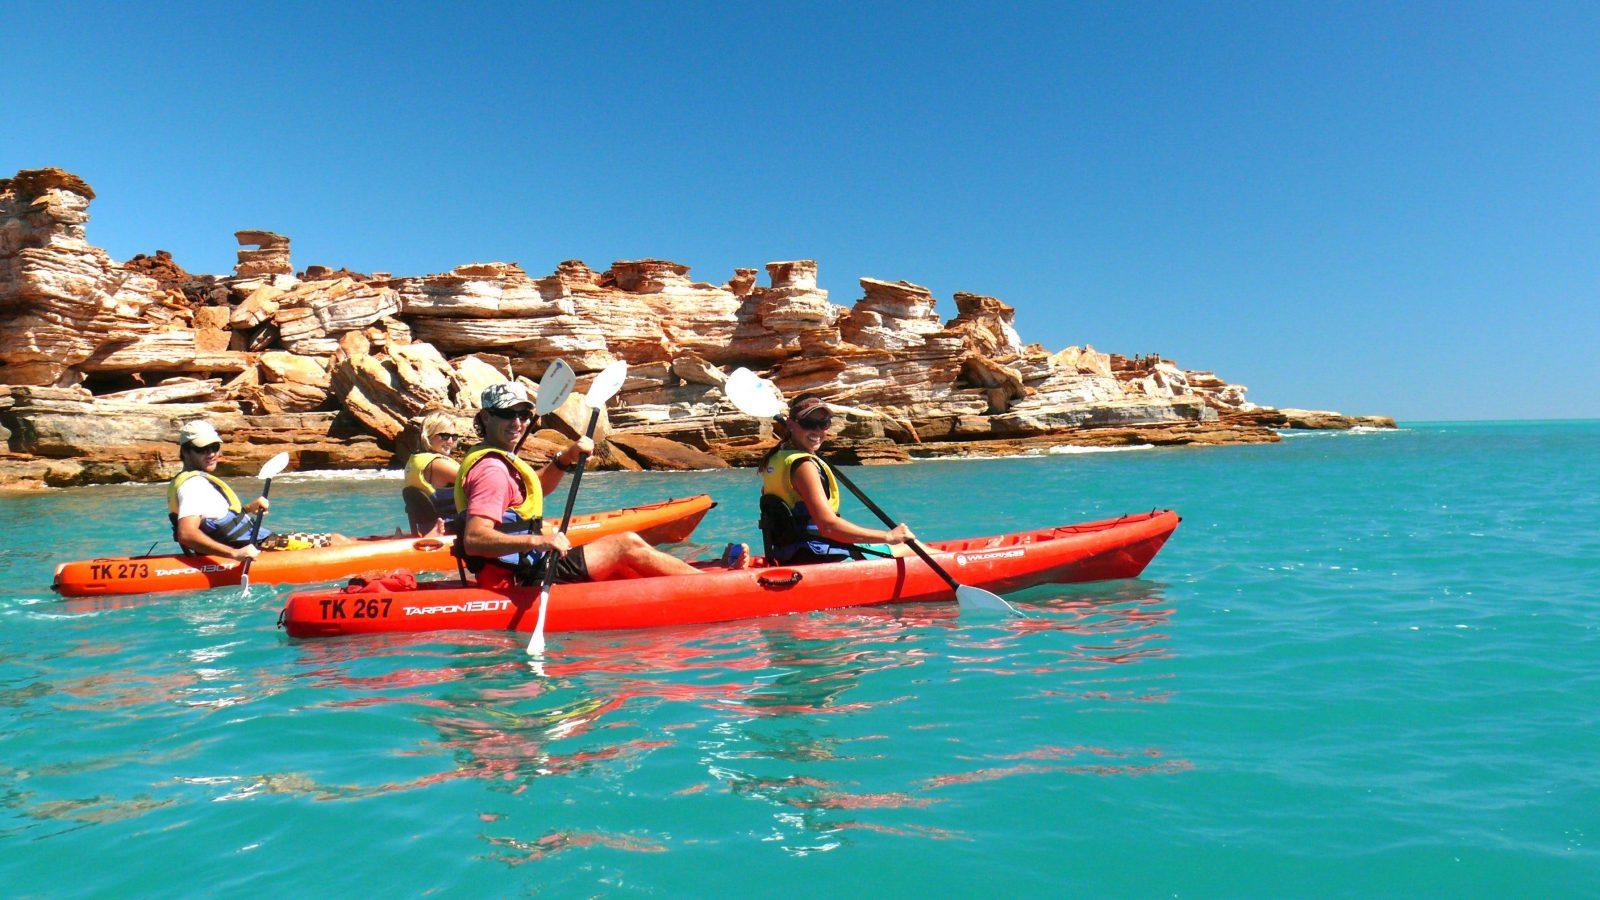 Broome Adventure Company, Broome, Western Australia